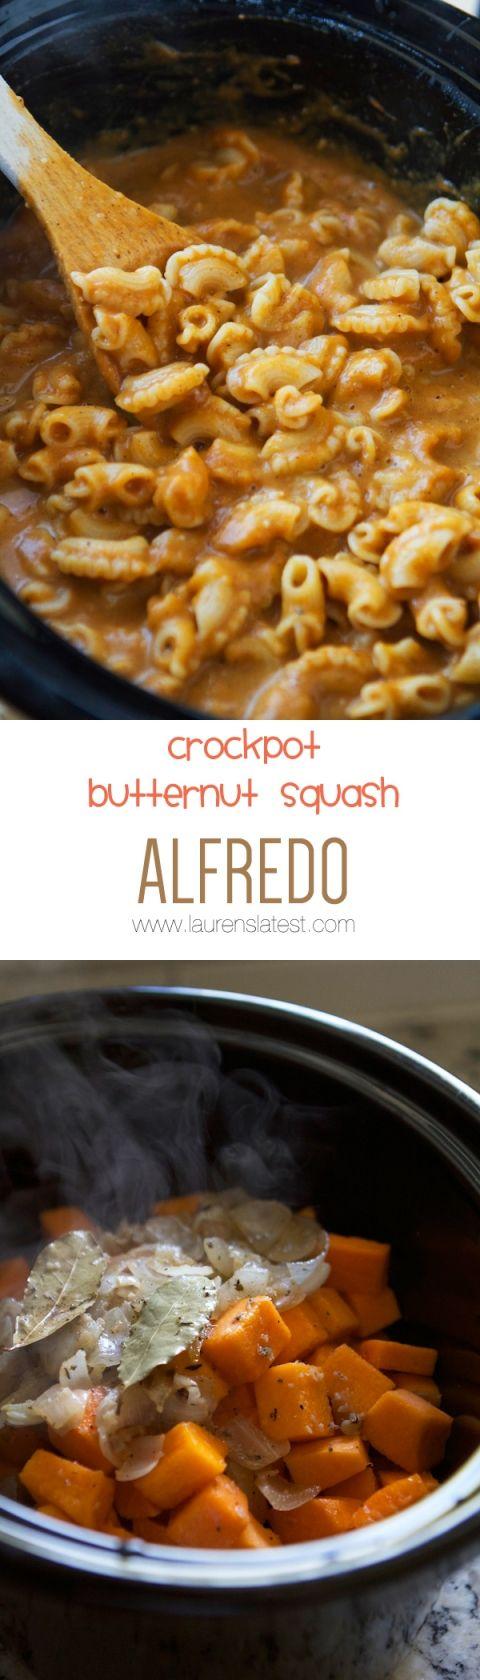 Crockpot Butternut squash. Sub the cream w/ full fat coconut milk, omit the cheese and serve over zucchini noodles